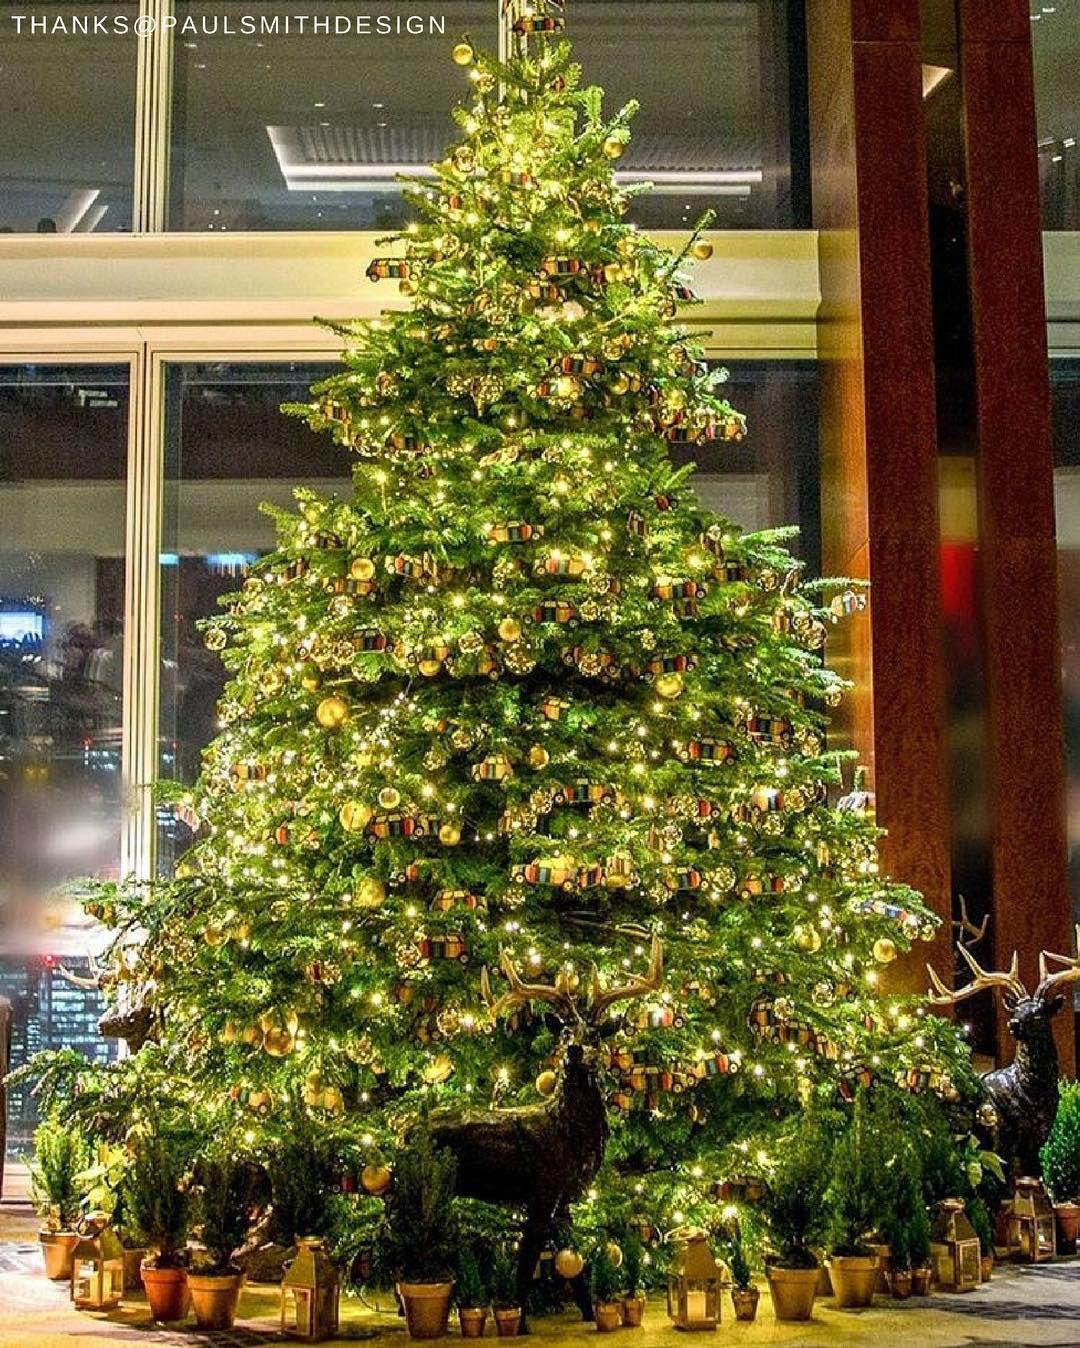 Because a fivestar Christmas simply requires a designer